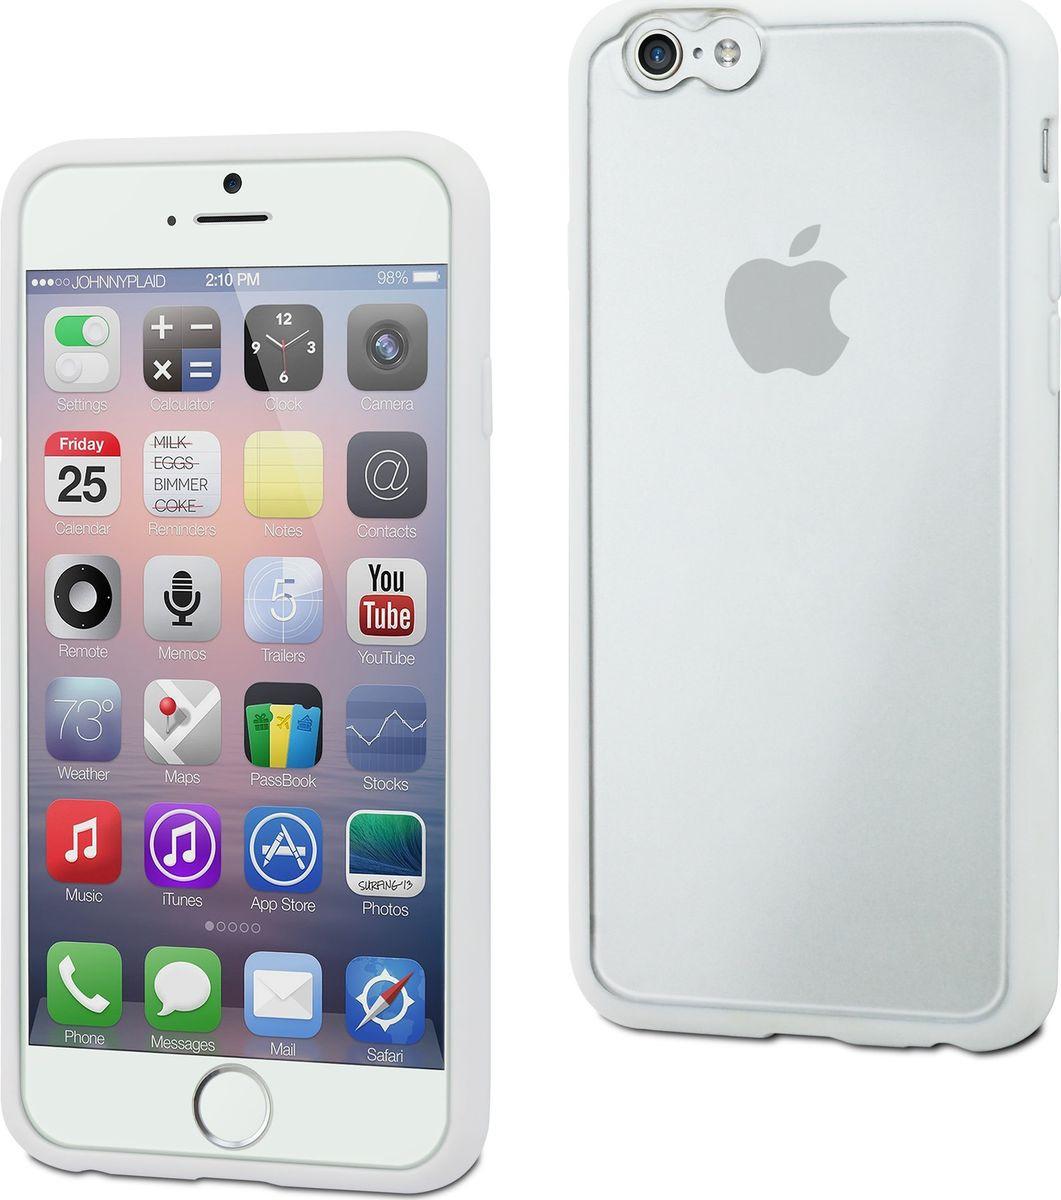 Чехол для сотового телефона Muvit MyFrame Case для Apple iPhone 6/6S Plus, MUBMC0104, белый чехол anycase art case для apple iphone 6 6s football 1